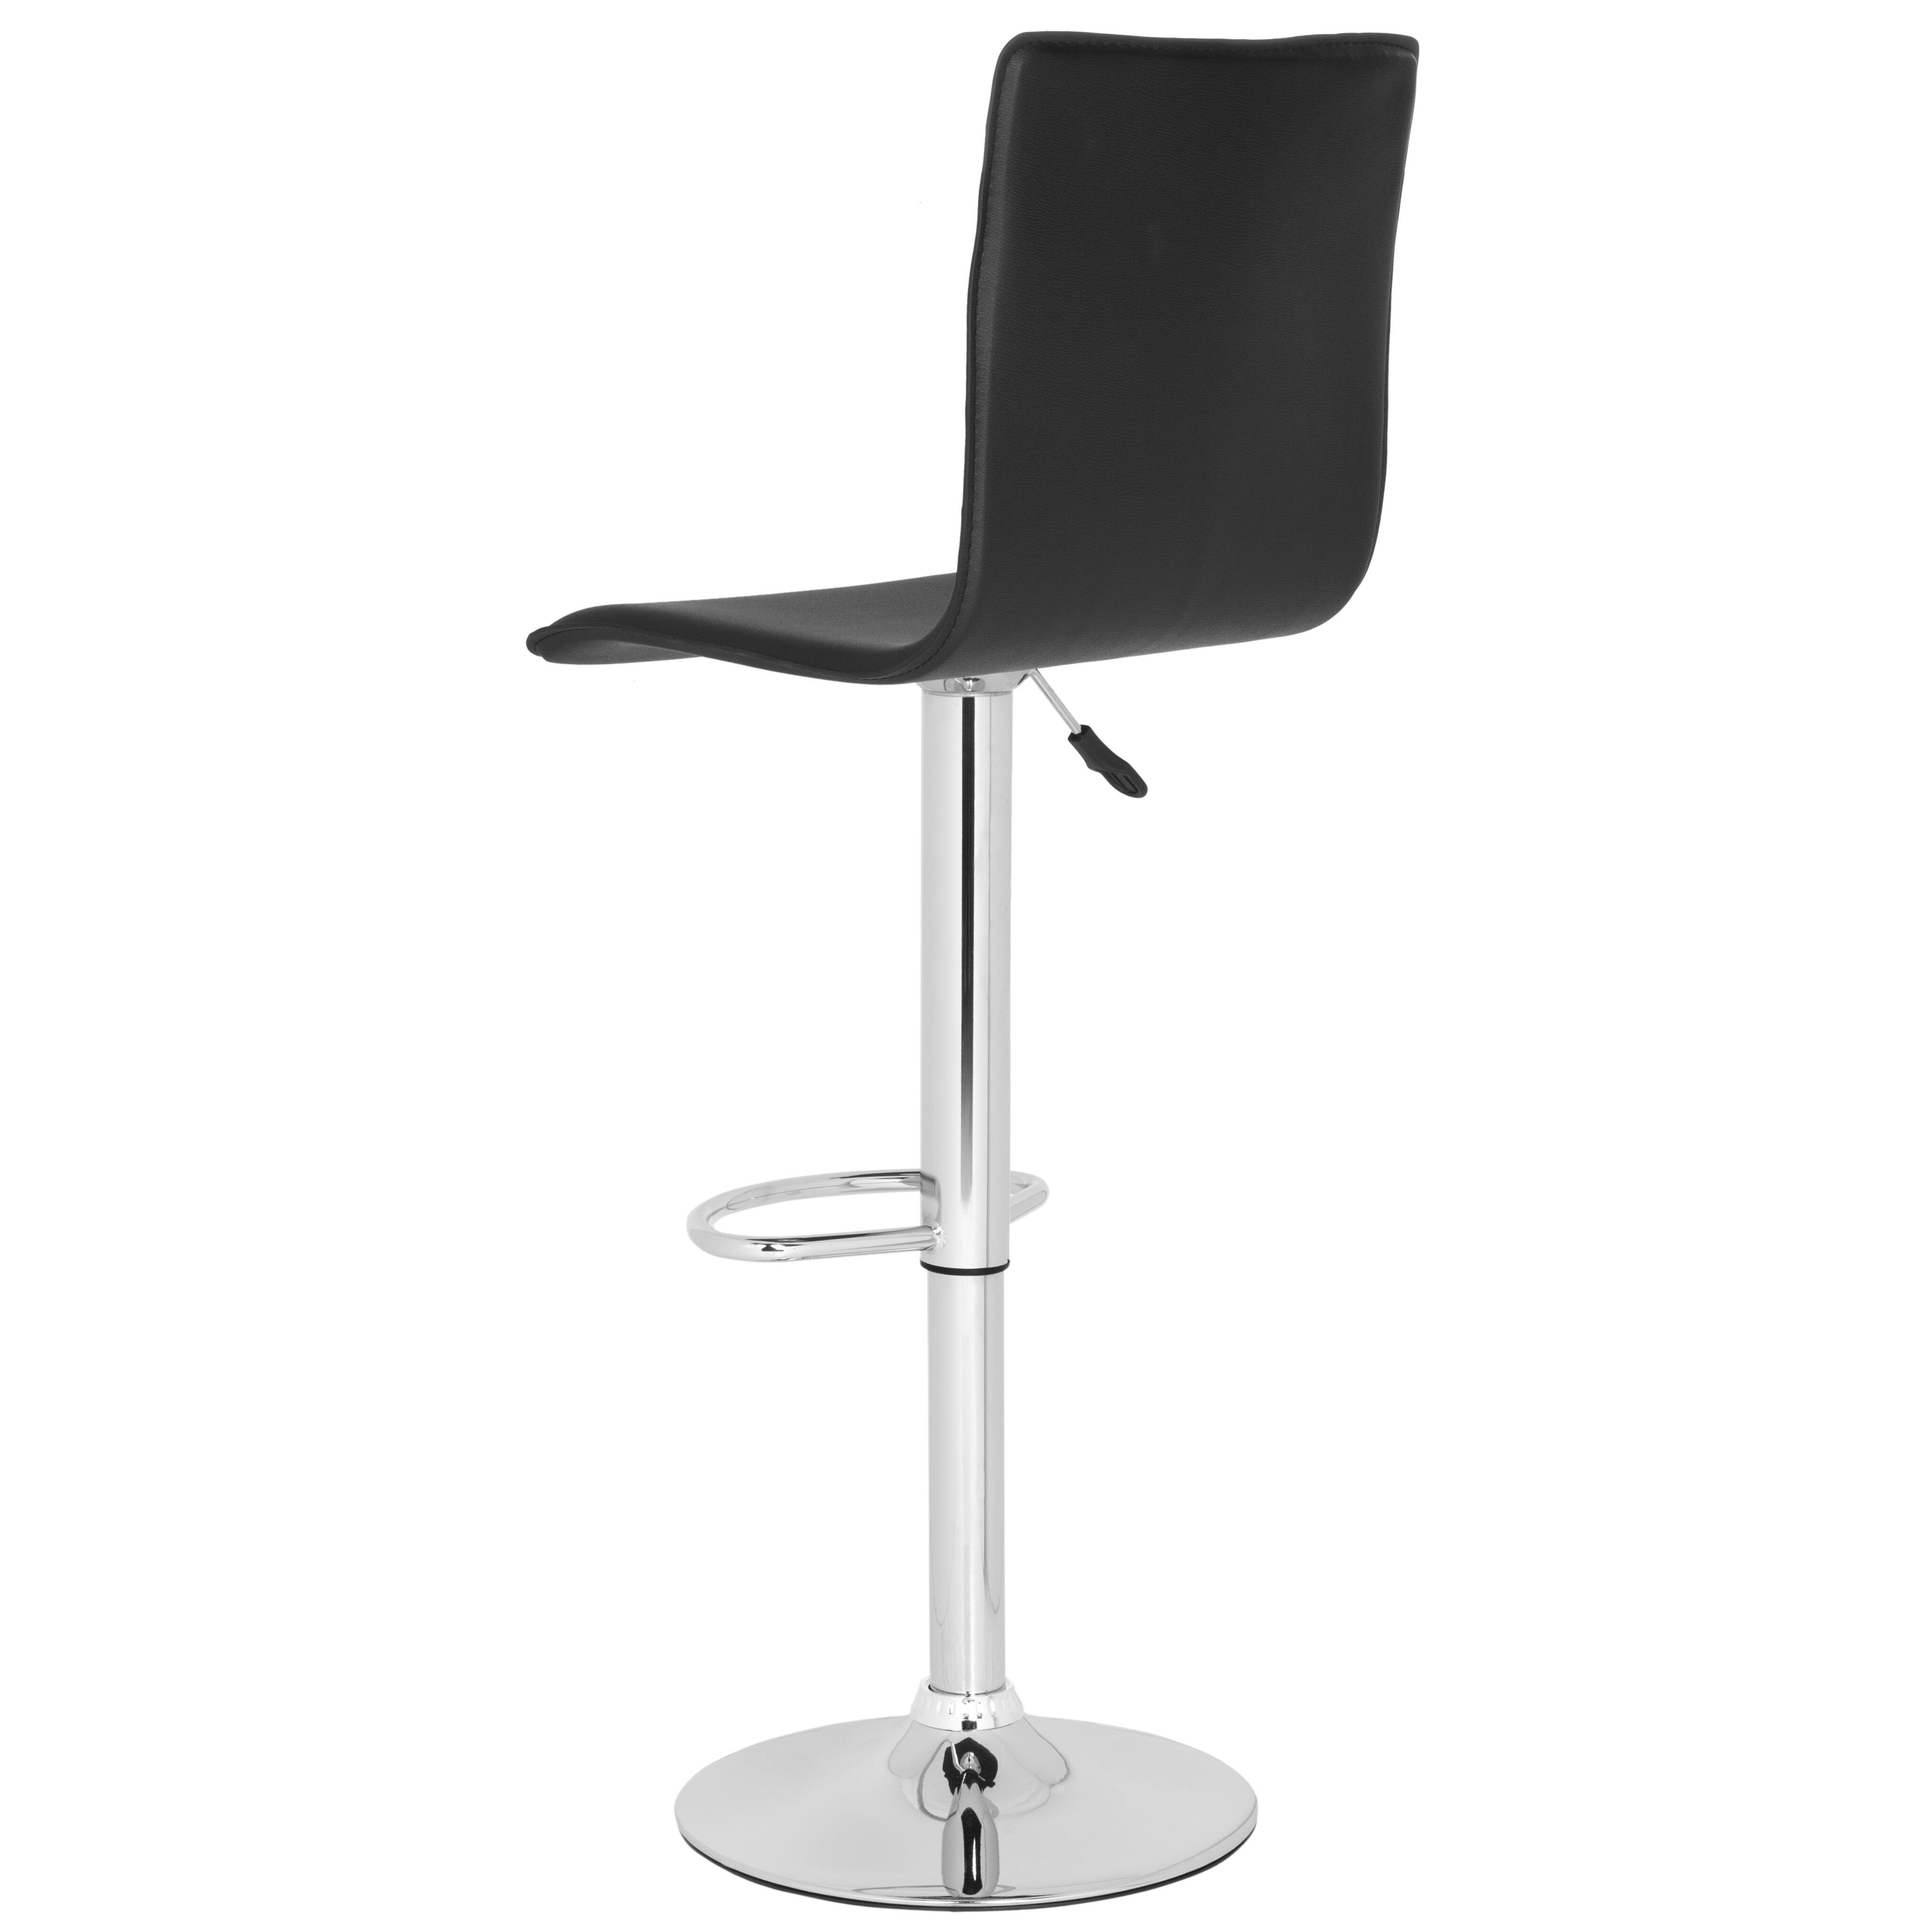 Safavieh magda adjustable height swivel bar stool for Bar stools clearance